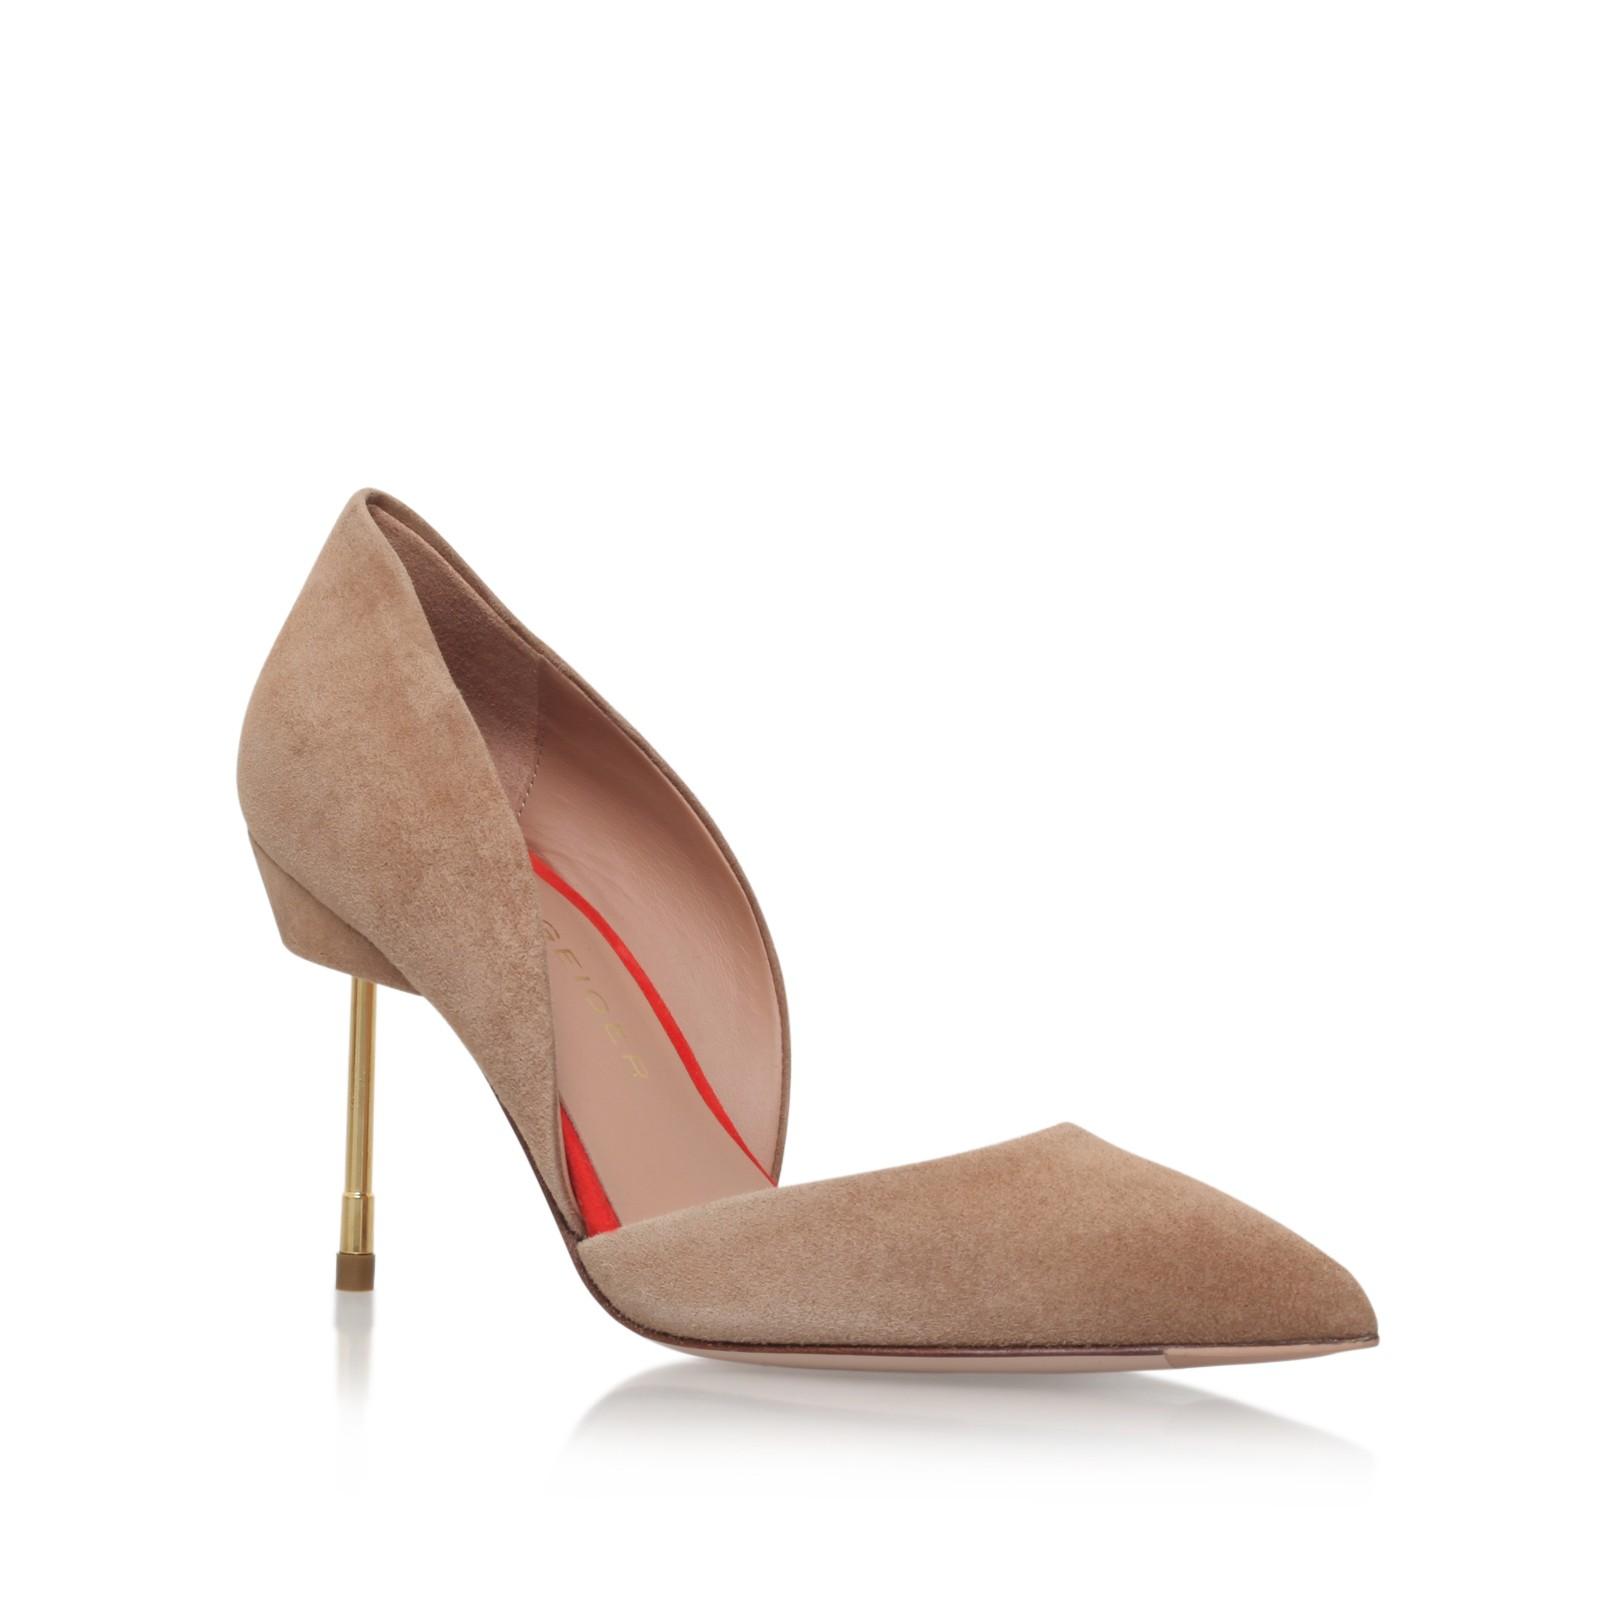 BEAUMONT Tan Mid Heel Court Shoes by Kurt Geiger London